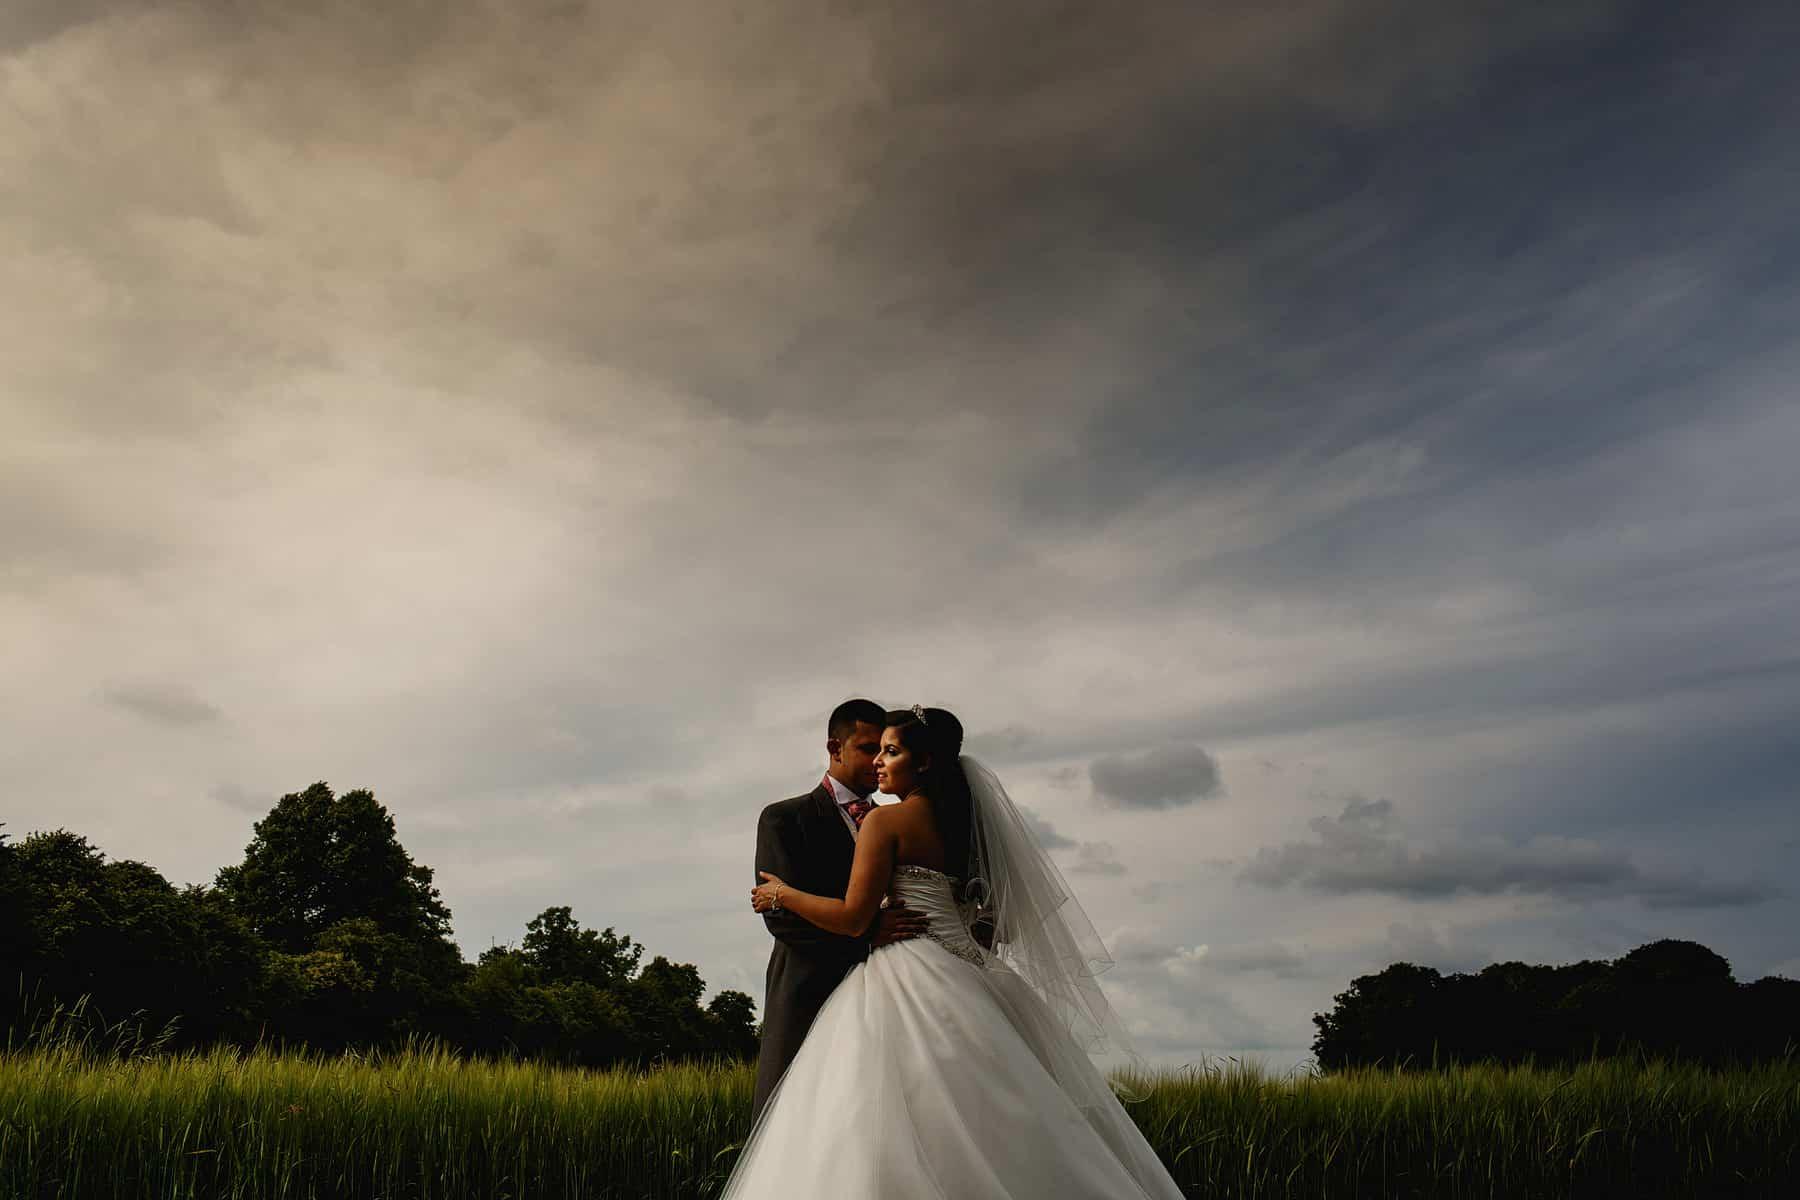 turkish wedding photography